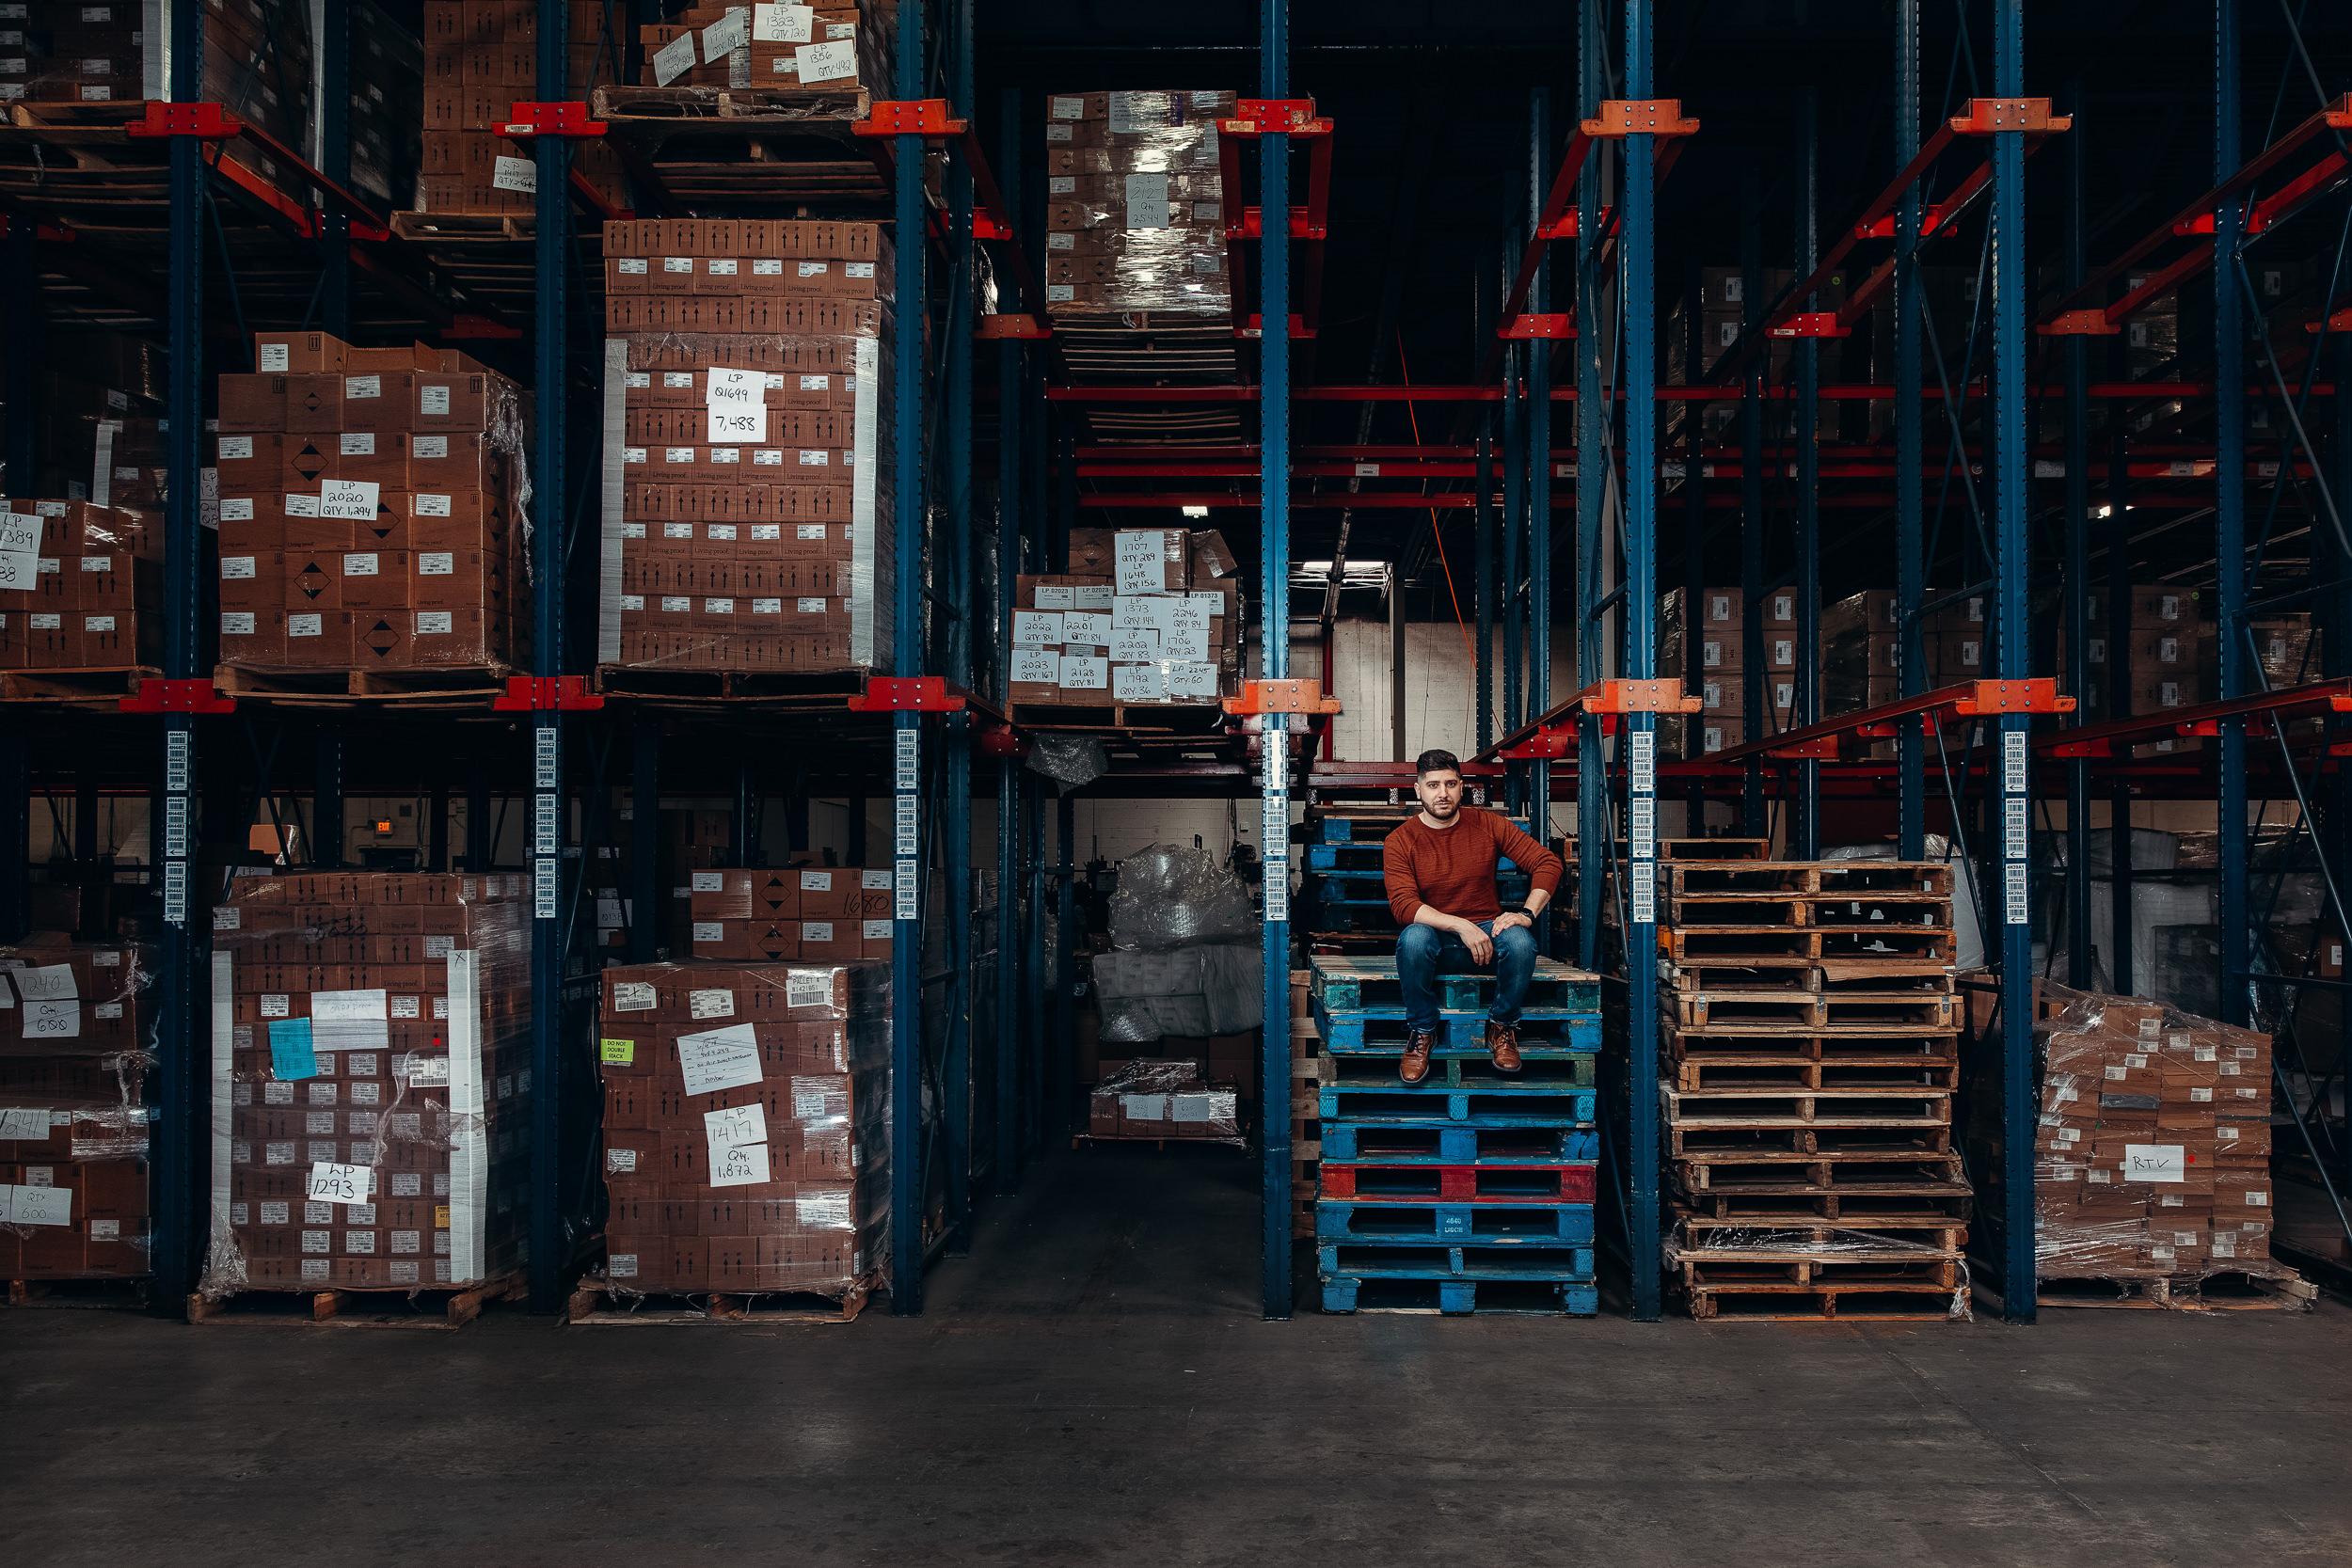 warehouse pallettes